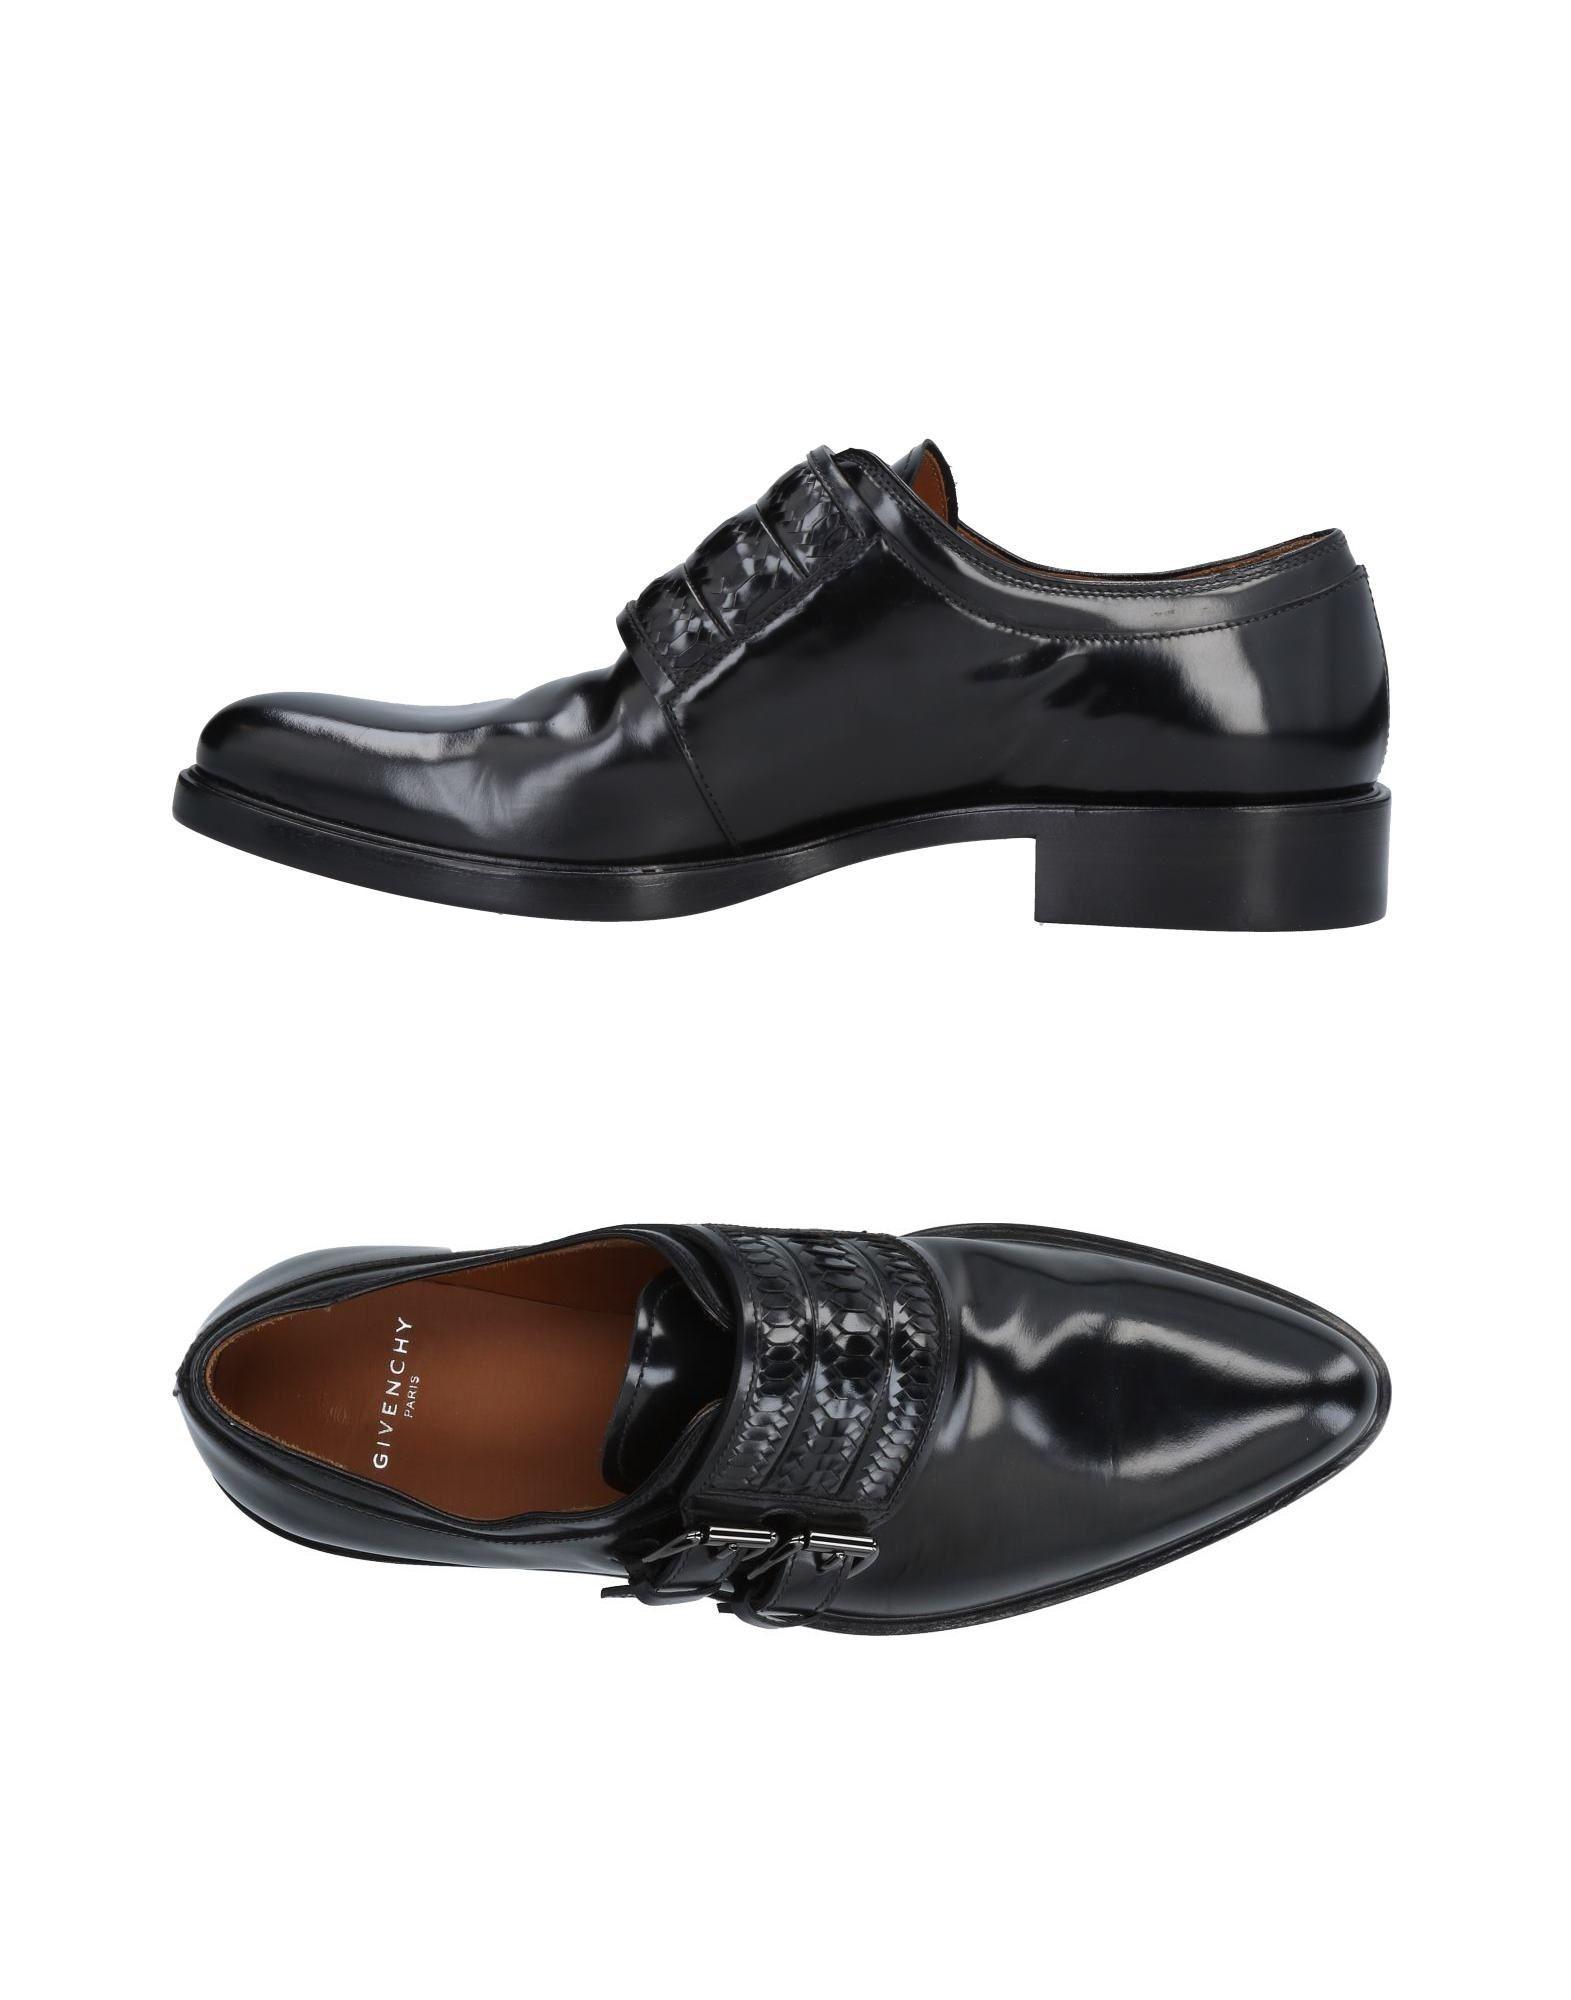 Givenchy Mokassins Herren  11481118JF Gute Qualität beliebte Schuhe